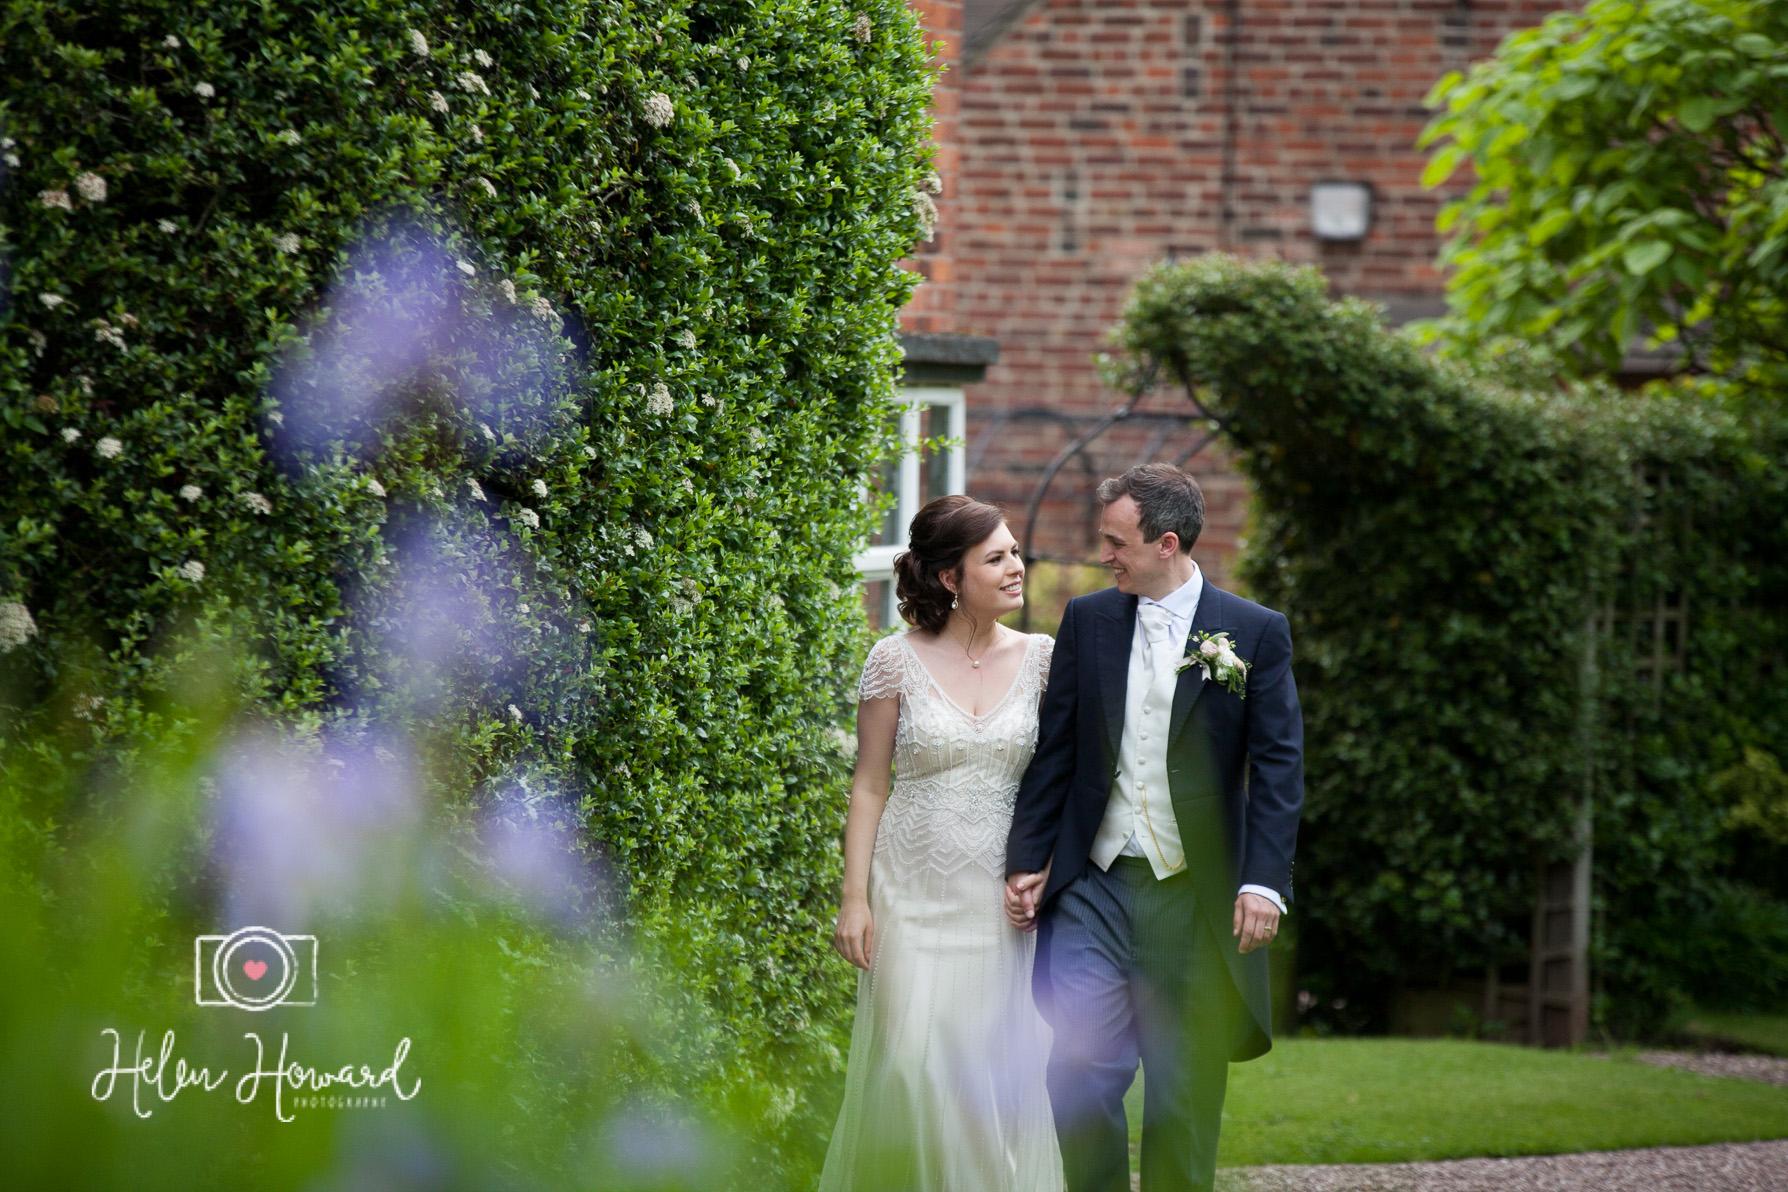 Helen Howard Photography Packington Moor Wedding-107.jpg